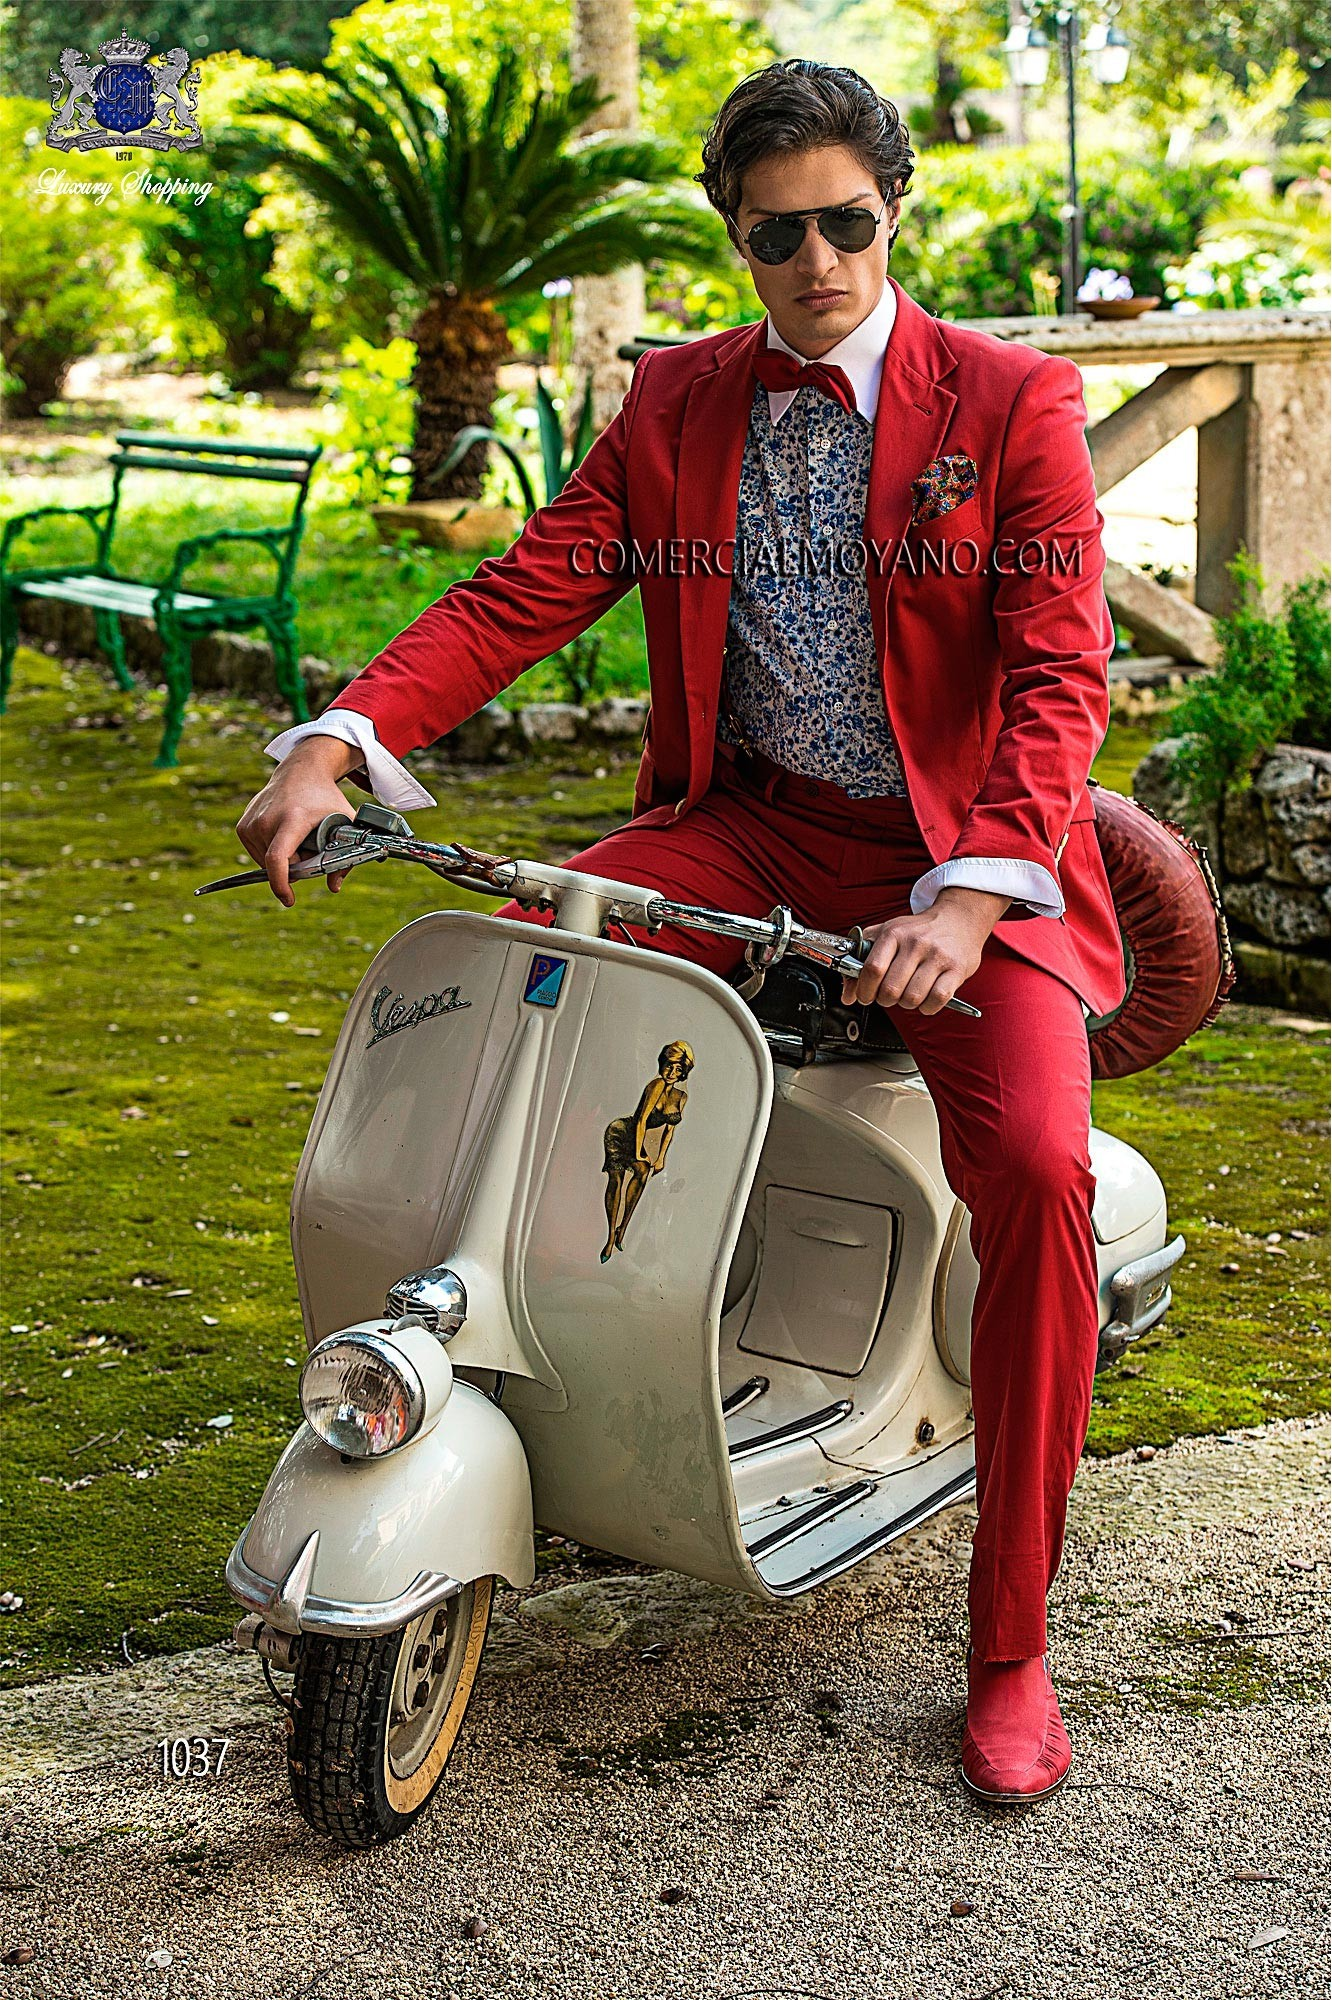 Traje de novio Hipster rojo modelo: 1037 Ottavio Nuccio Gala colección Hipster 2017